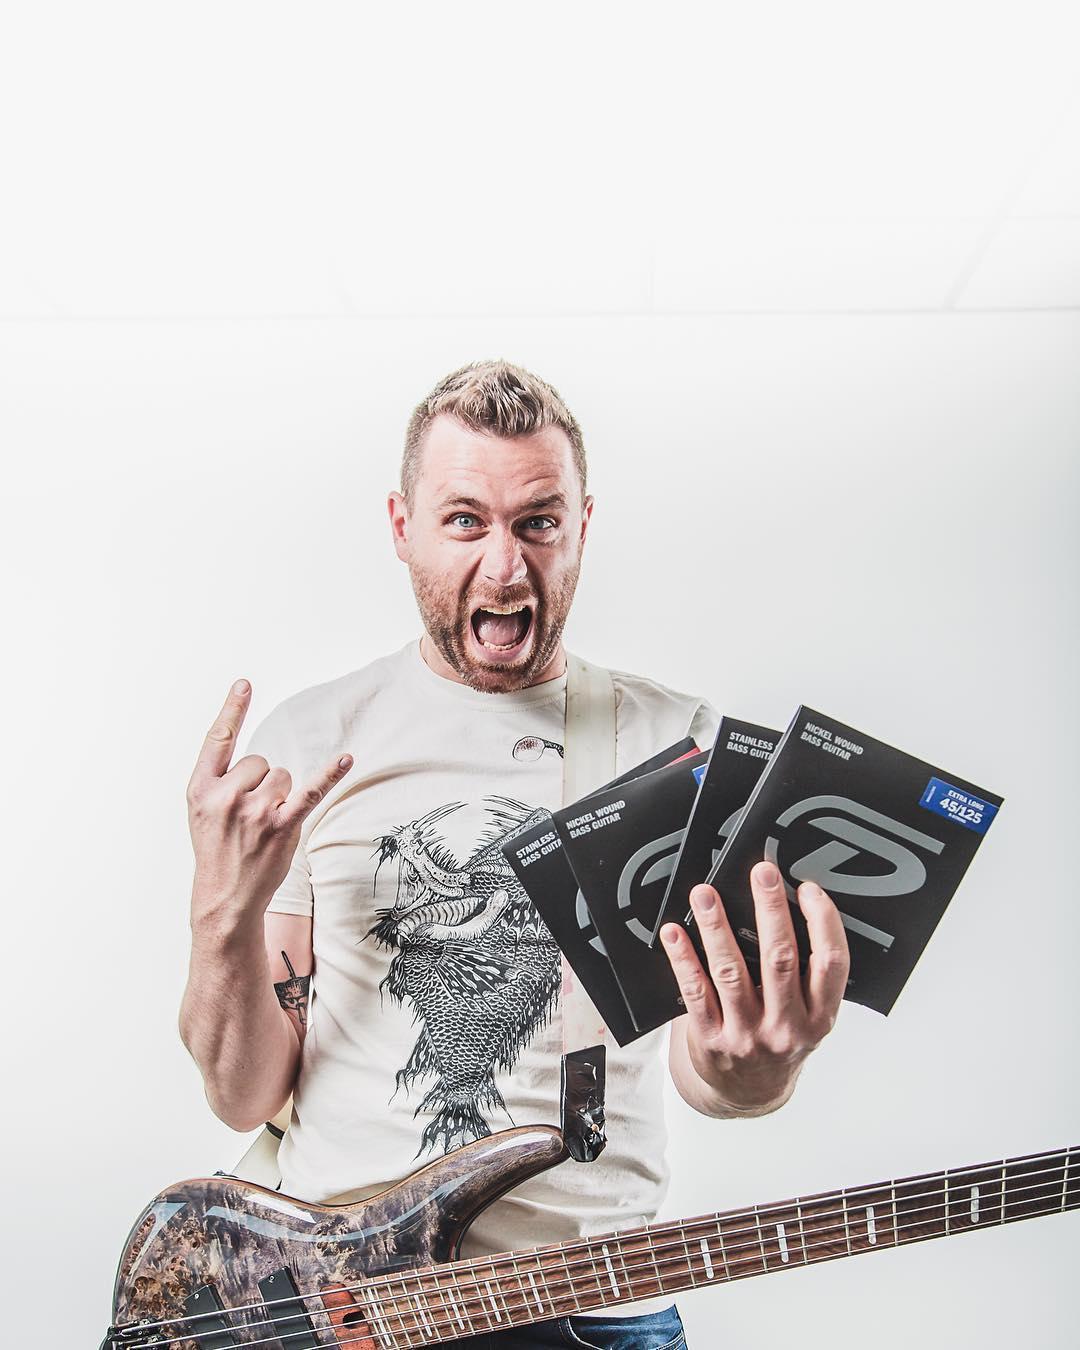 Dries VerhaertDunlop - Dries Verhaert plays the bass guitar in BEAR.https://www.facebook.com/dries.verhaerthttps://www.instagram.com/driesverhaert/